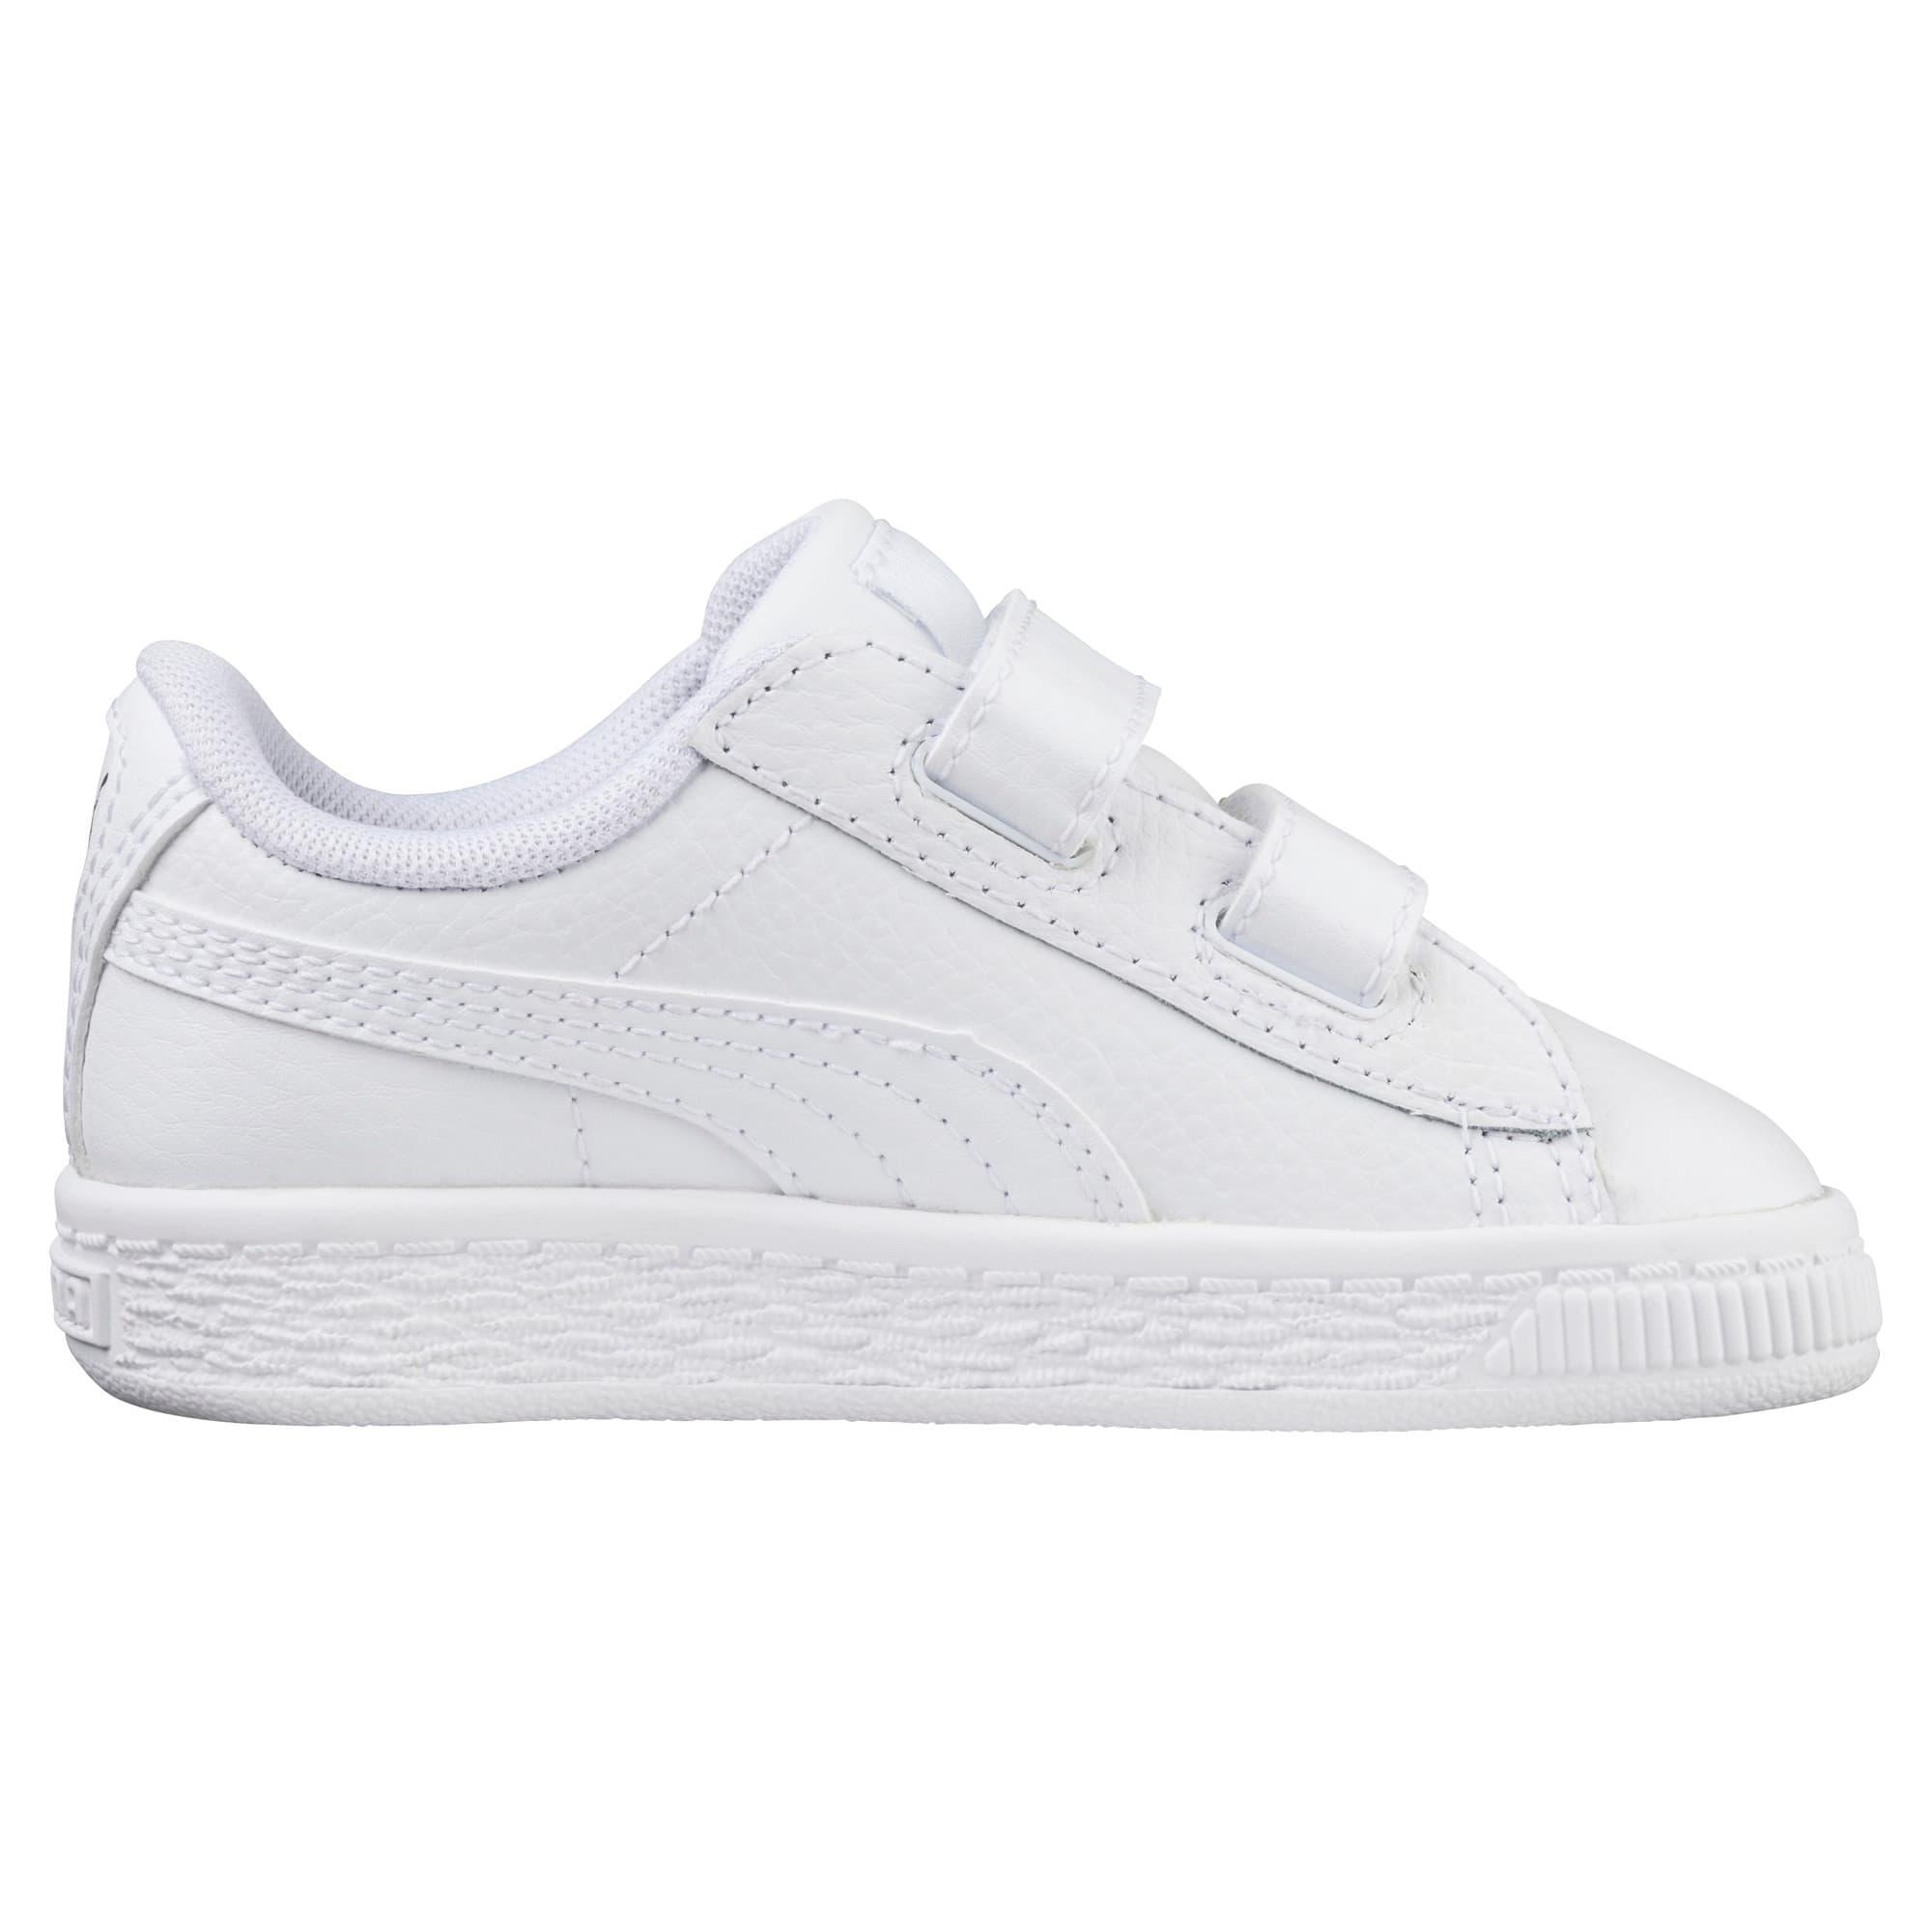 Thumbnail 3 of Basket Classic AC Toddler Shoes, Puma White-Puma White, medium